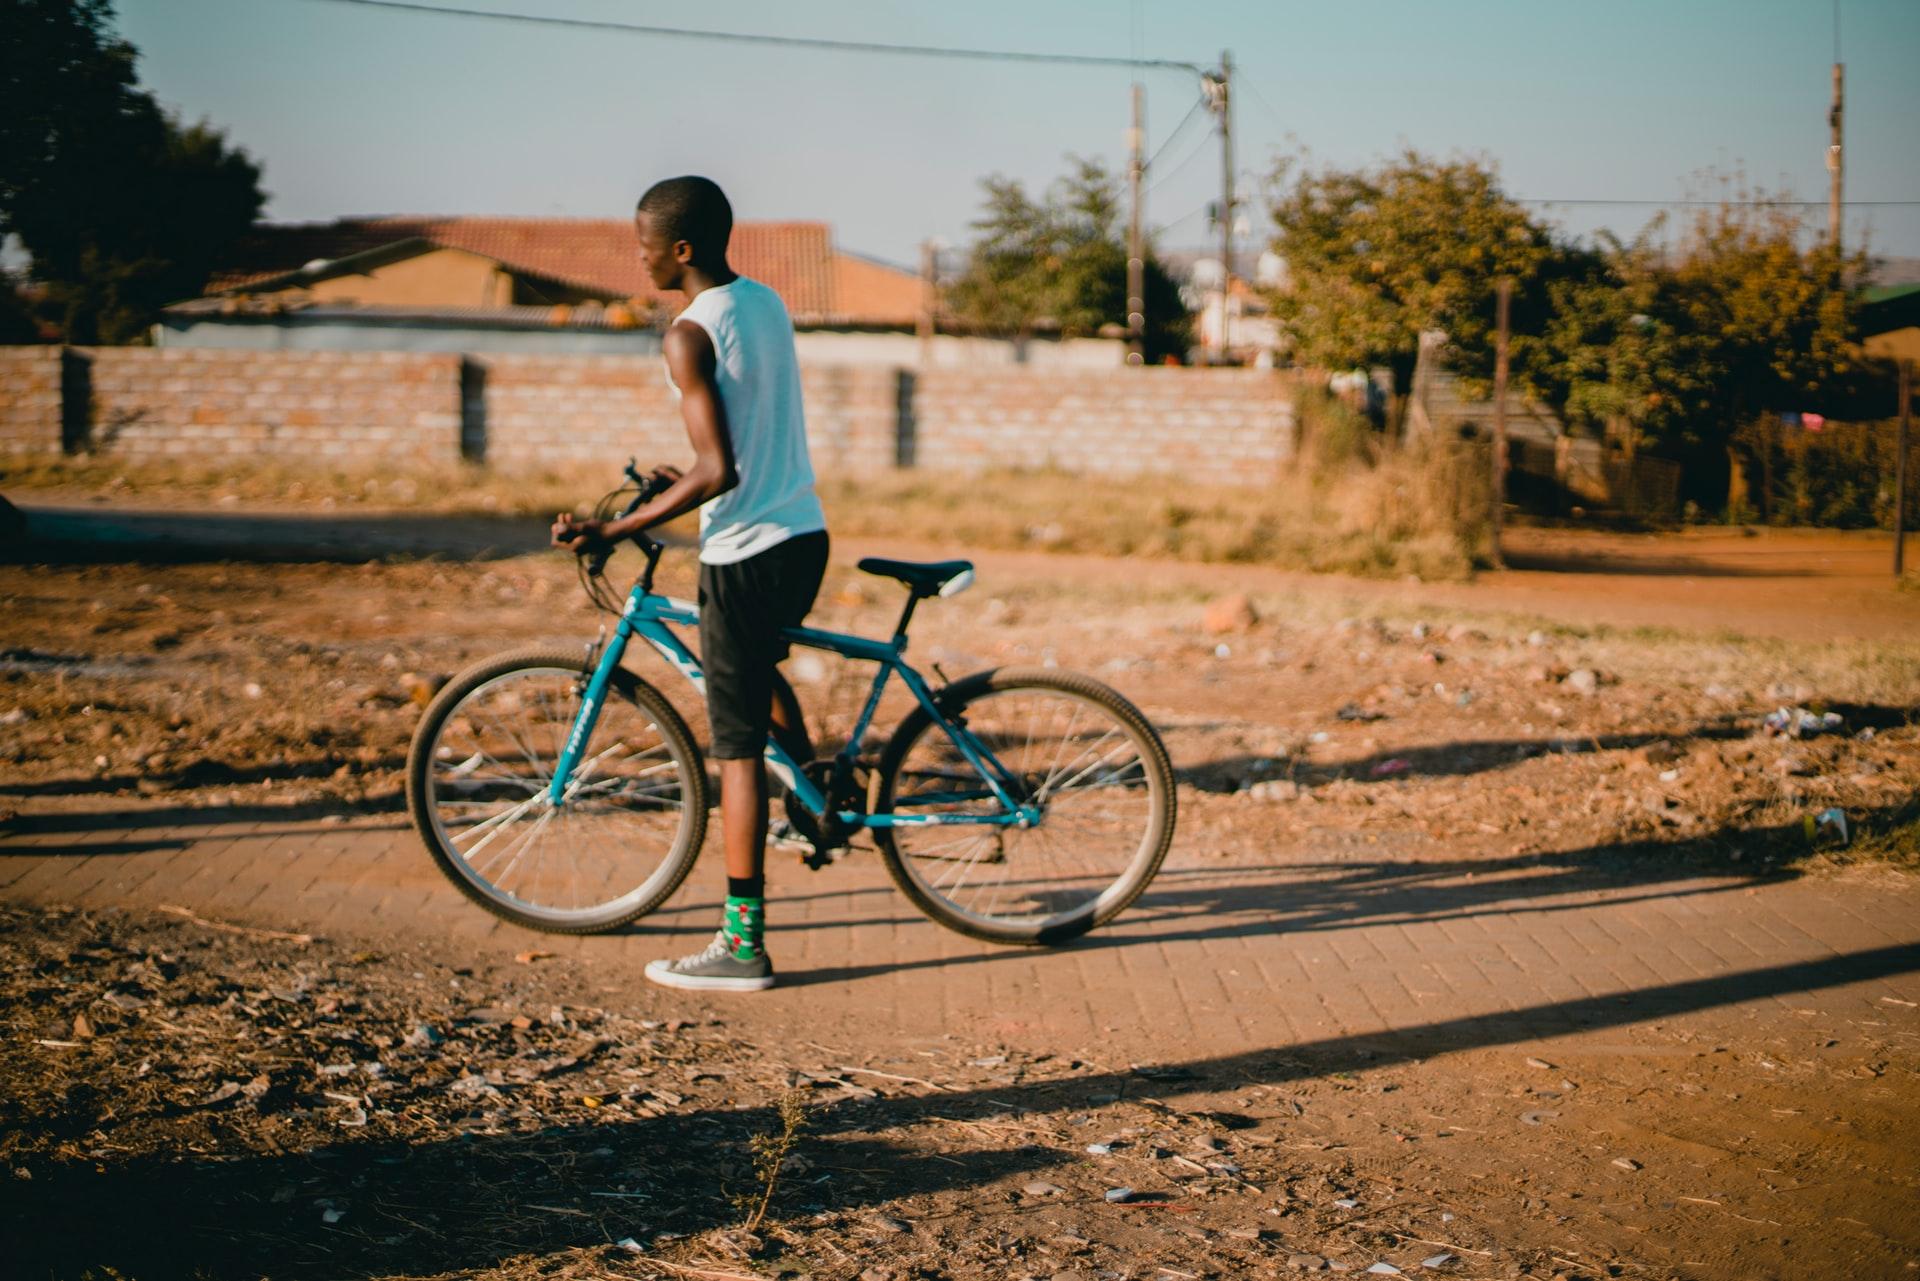 Unsplash / Rachel Martin / South Africa